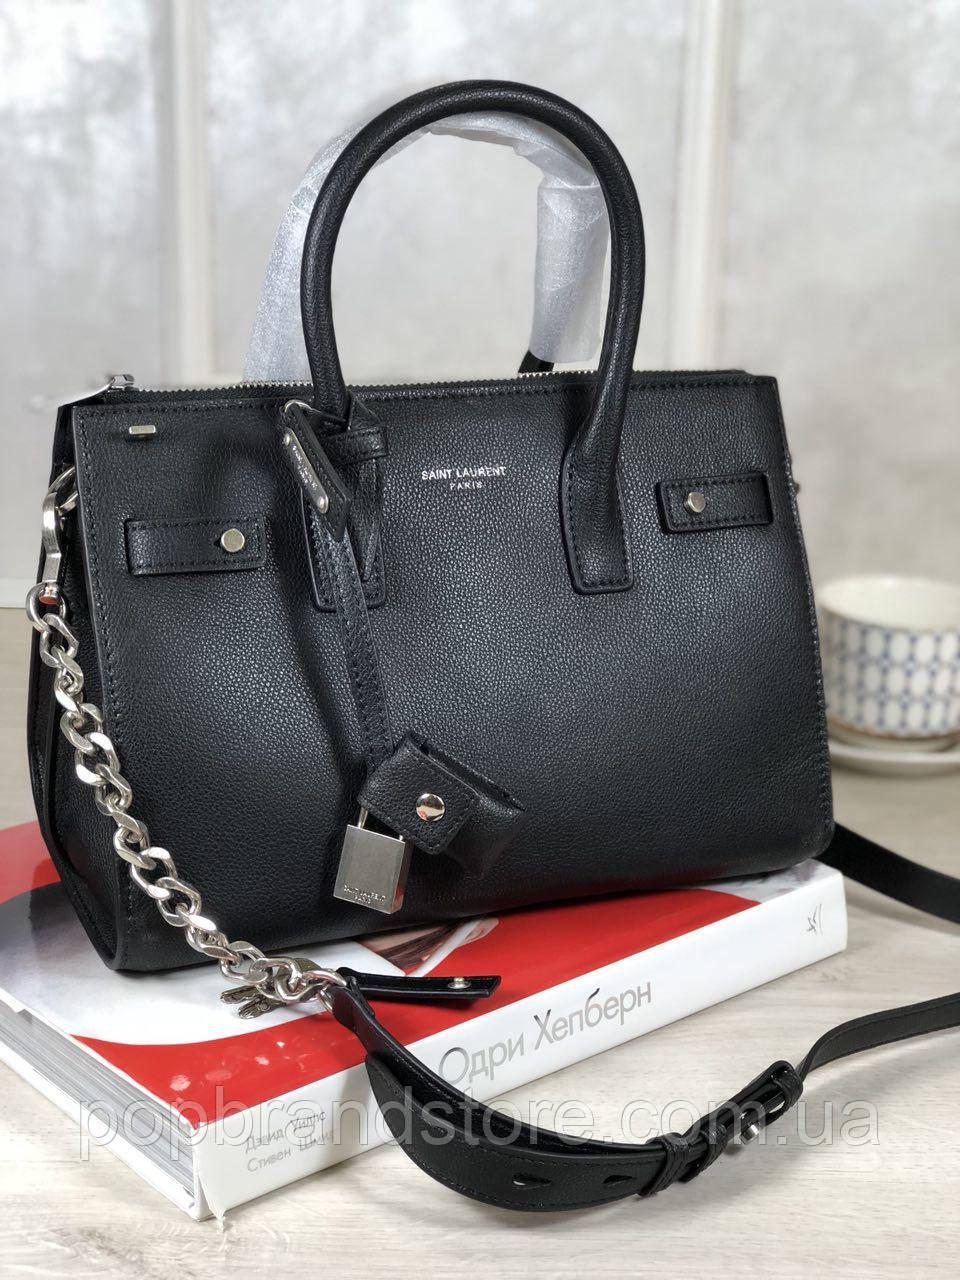 cec2faee2a19 Классическая женская сумка SAINT LAURENT Sac de Jour 26 см (реплика) - Pop  Brand